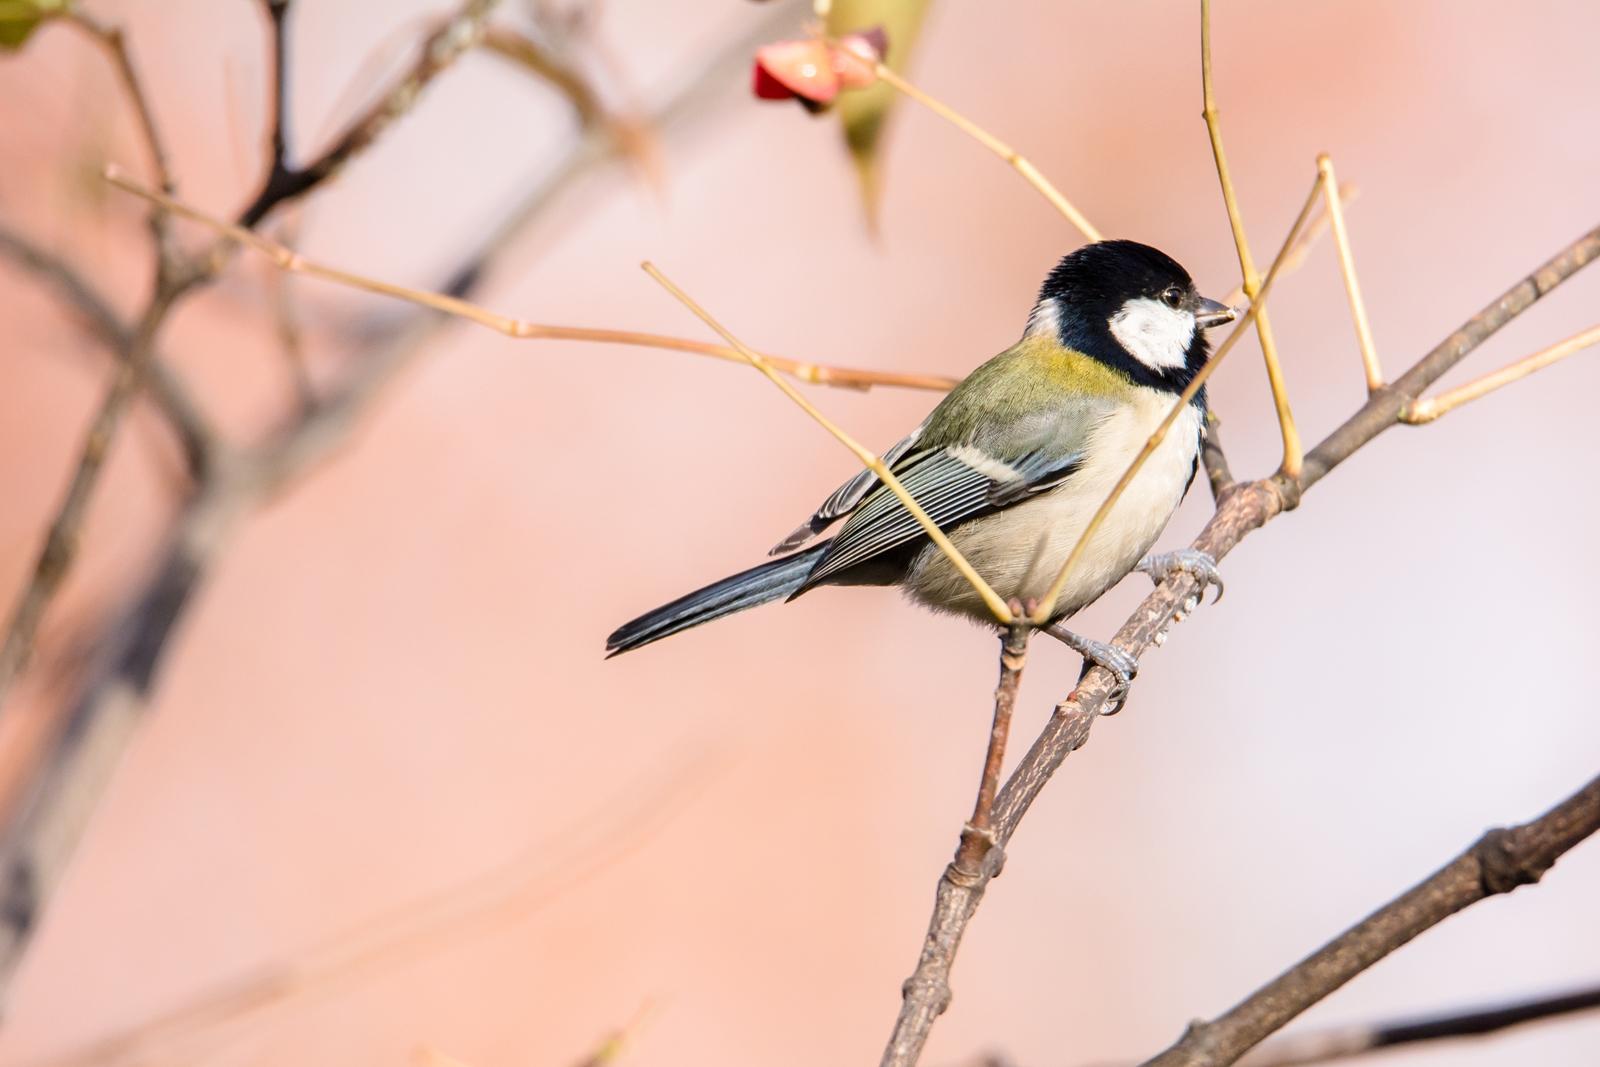 Photo: 色の温かさ Warmth of color  冬になり 葉は落ち 少し寂しい季節 でも木々は見せてくれる 温かな色合い  Japanese Tit. (シジュウカラ) #cooljapan #365cooljapanmay #birdphotography #birds #kawaii Nikon D7100 SIGMA 150-600mm F5-6.3 DG OS HSM Sports [ Day240, January 7th ]